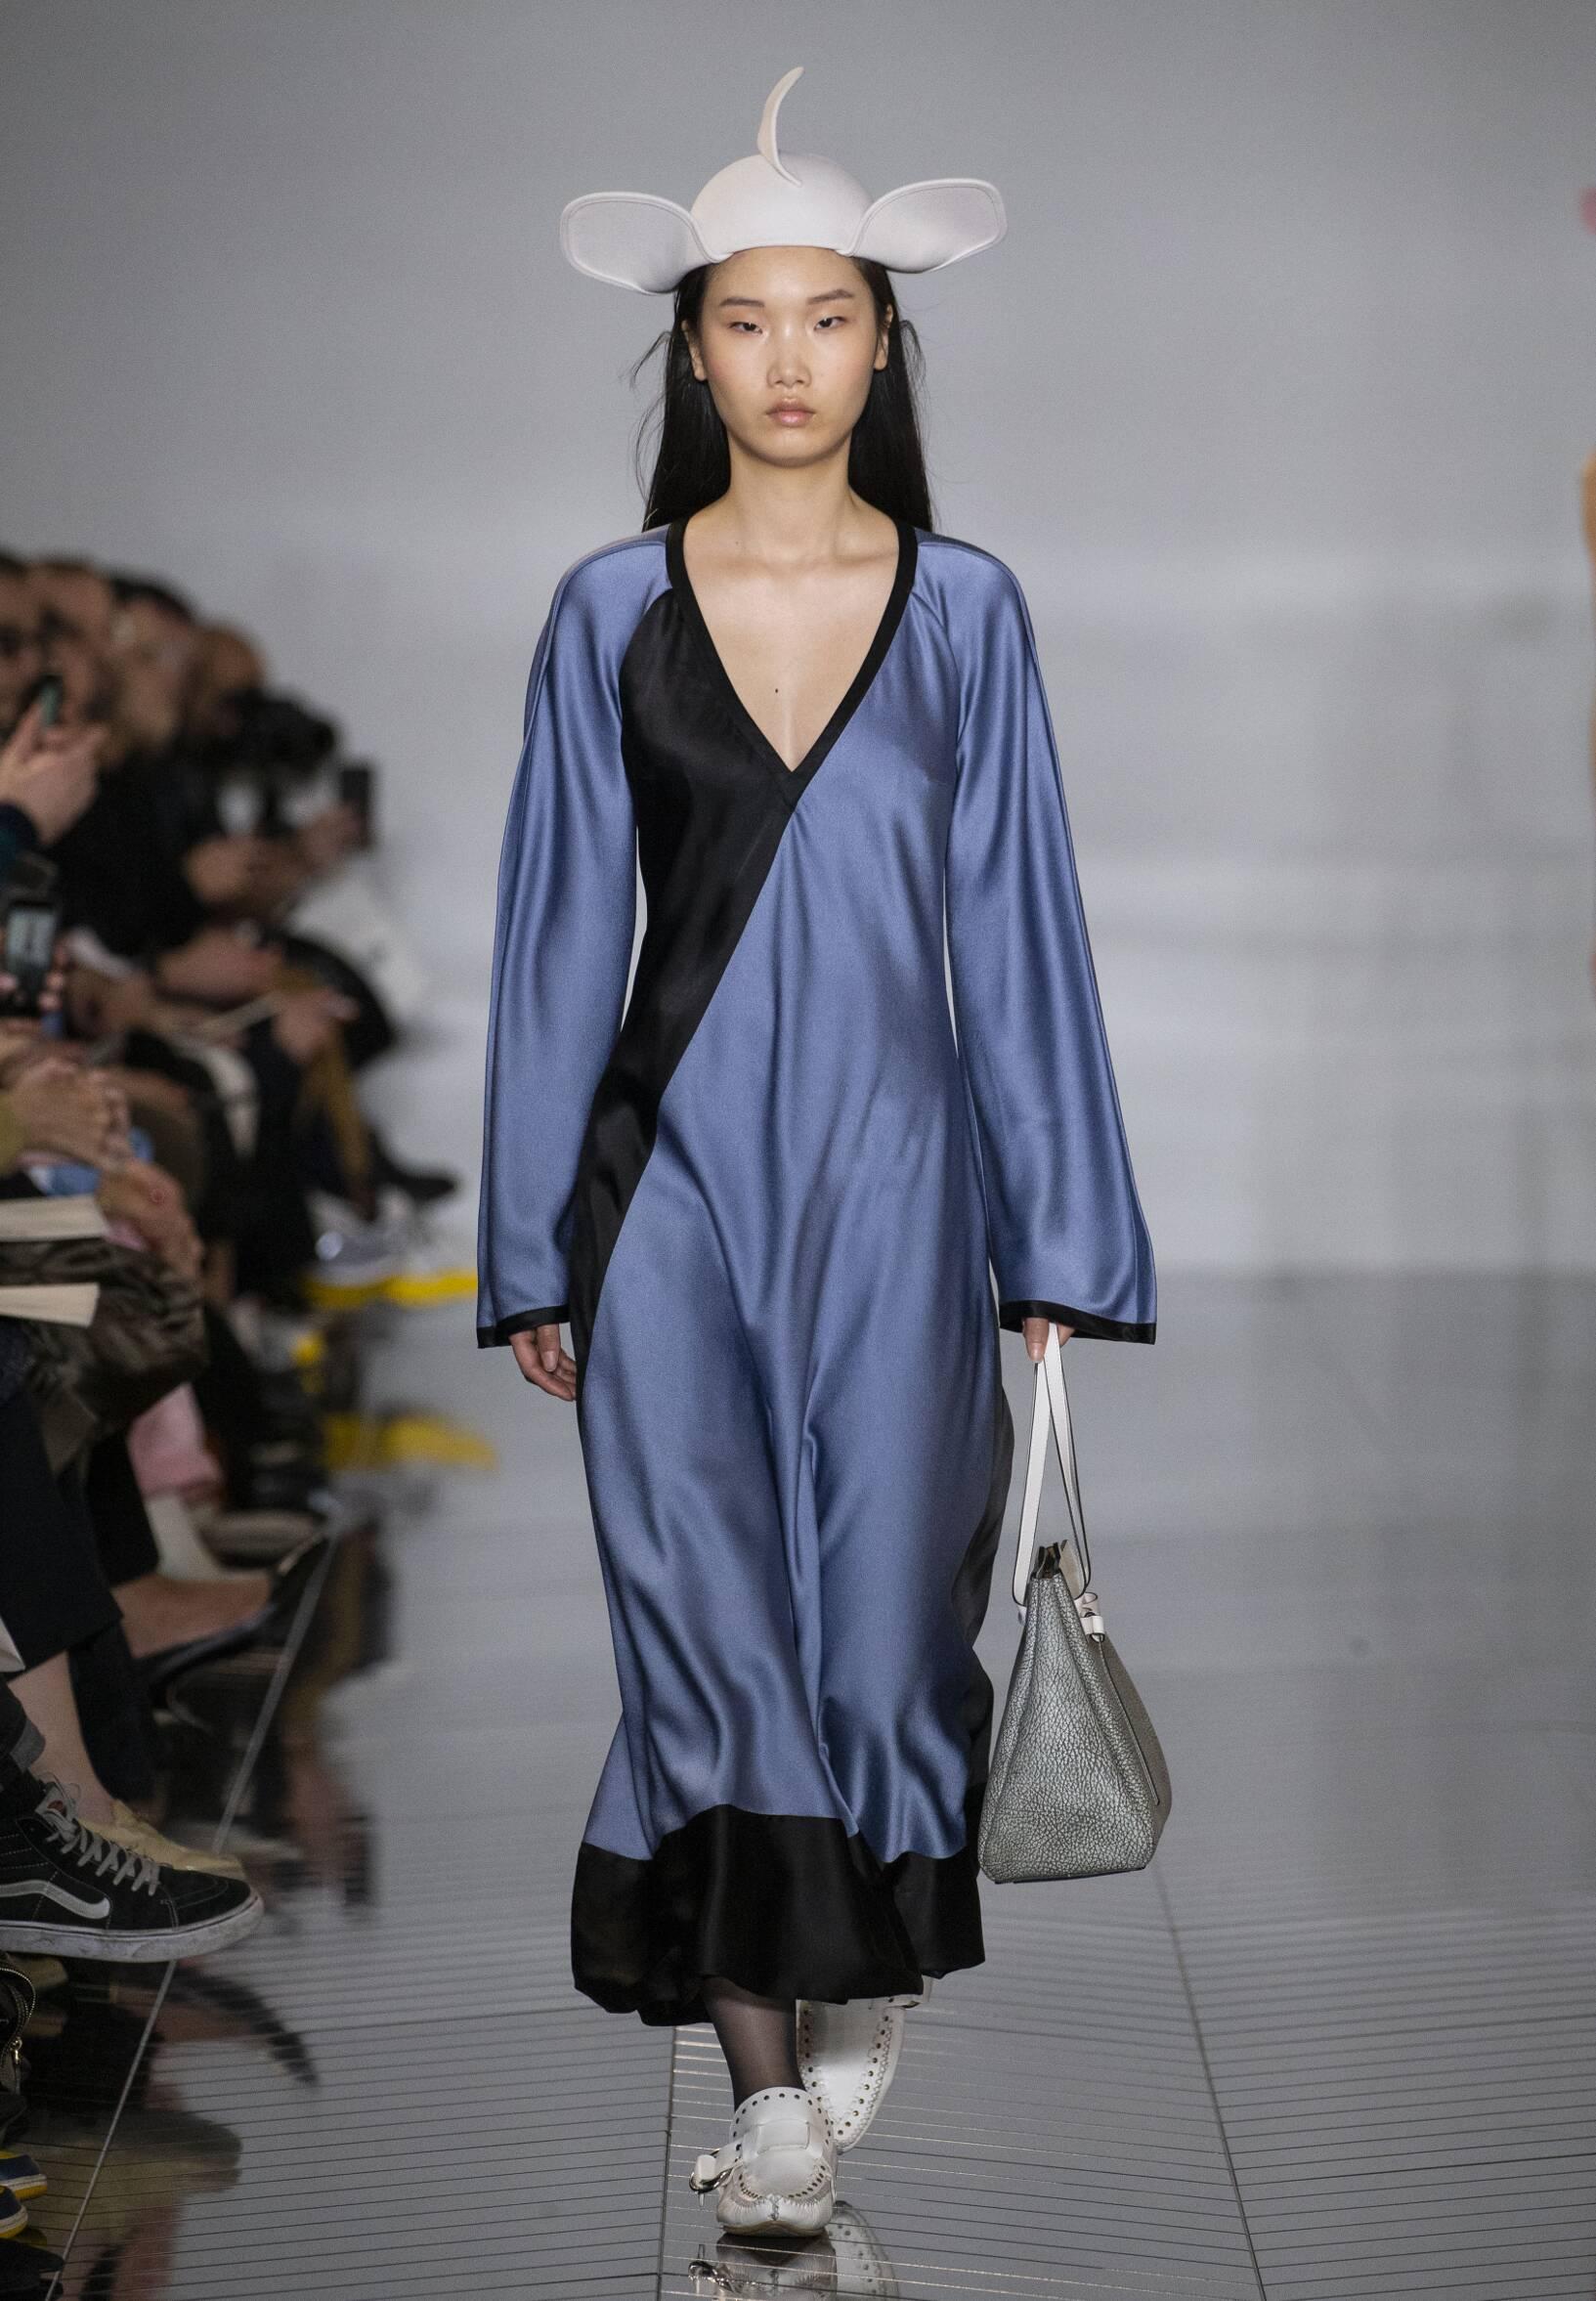 Loewe FW 2019 Womenswear